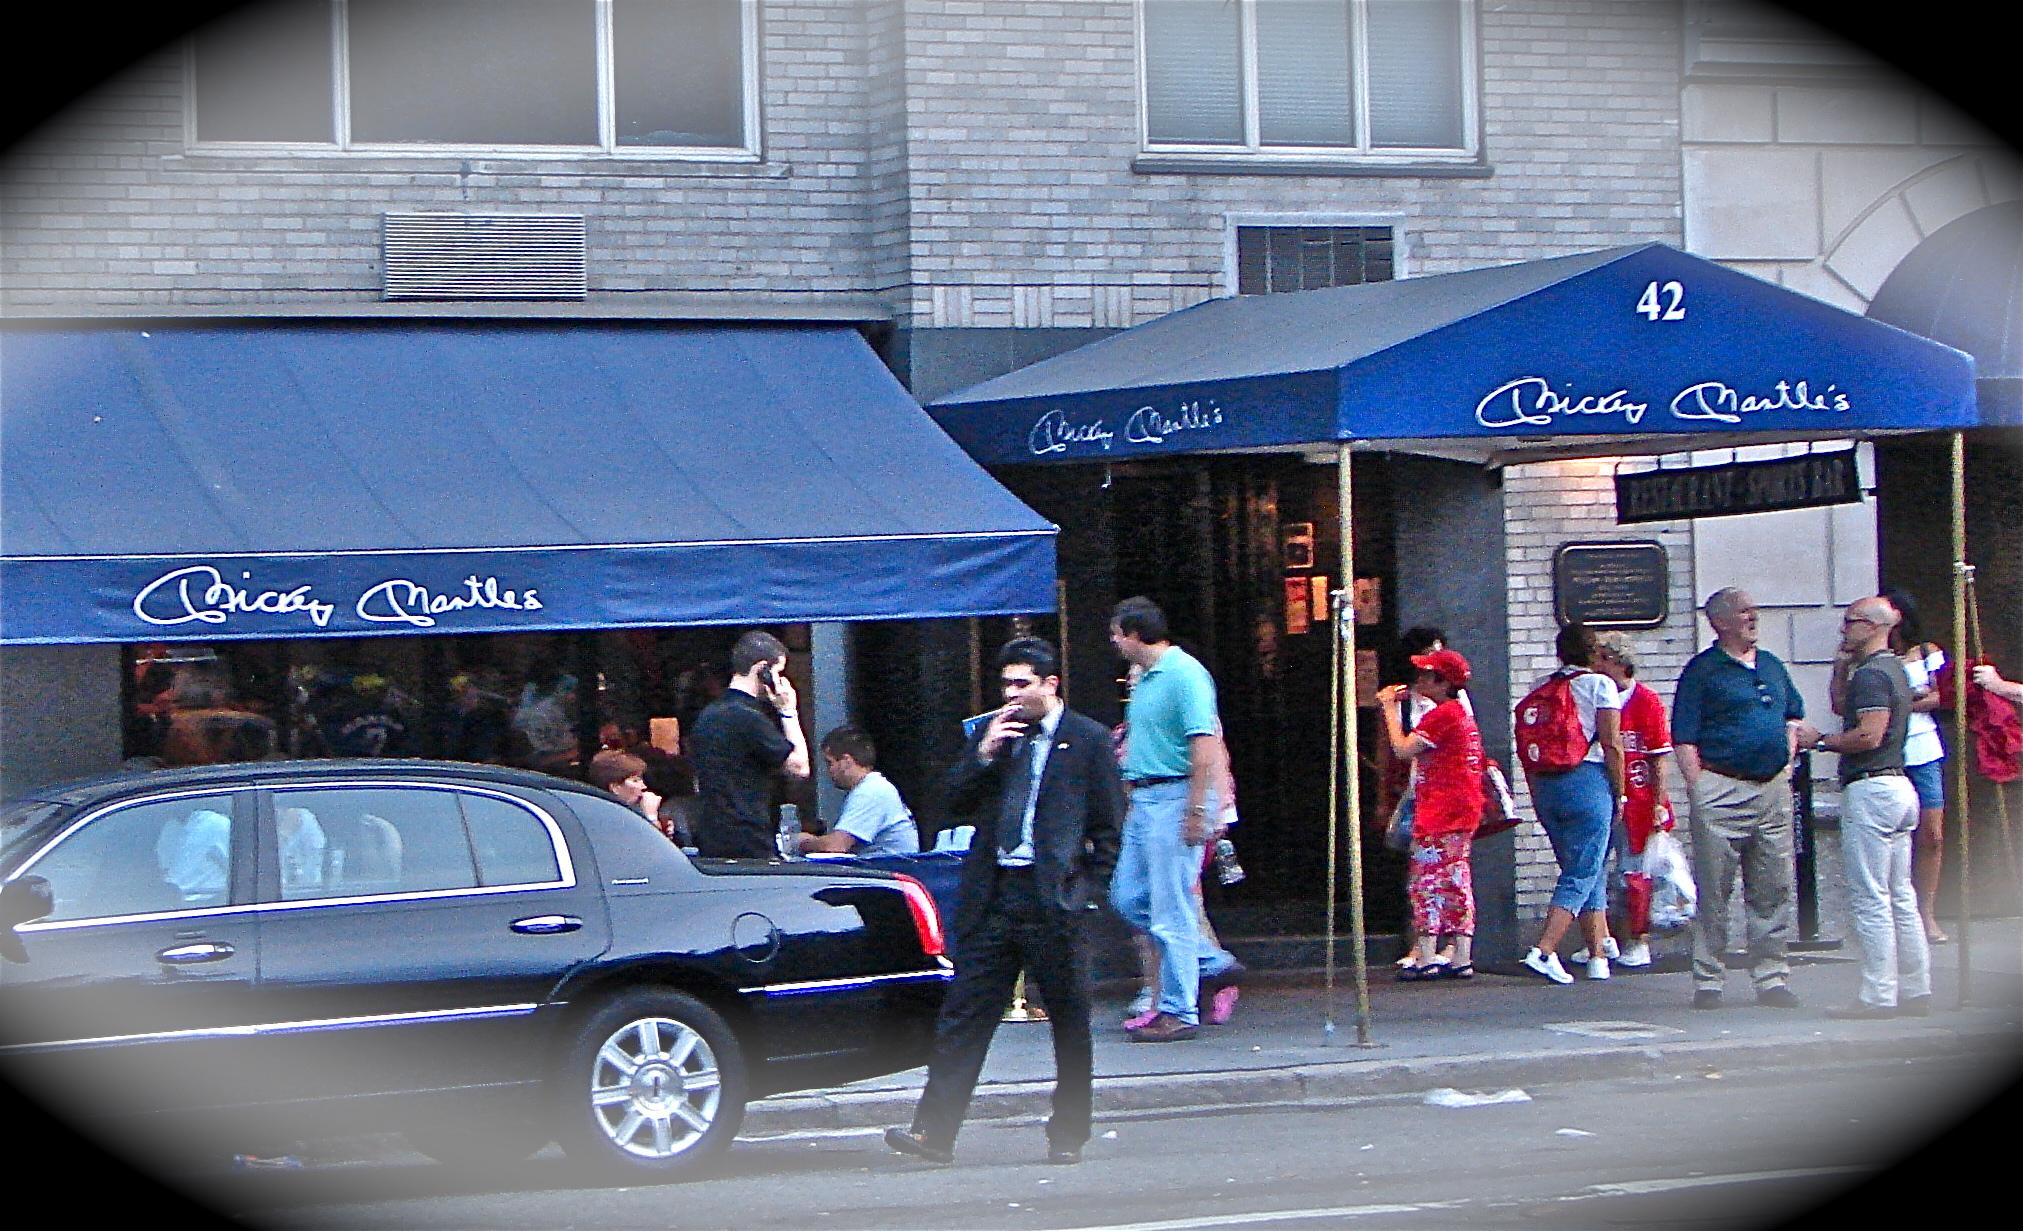 Mickey Mantle Restaurant Nyc Menu